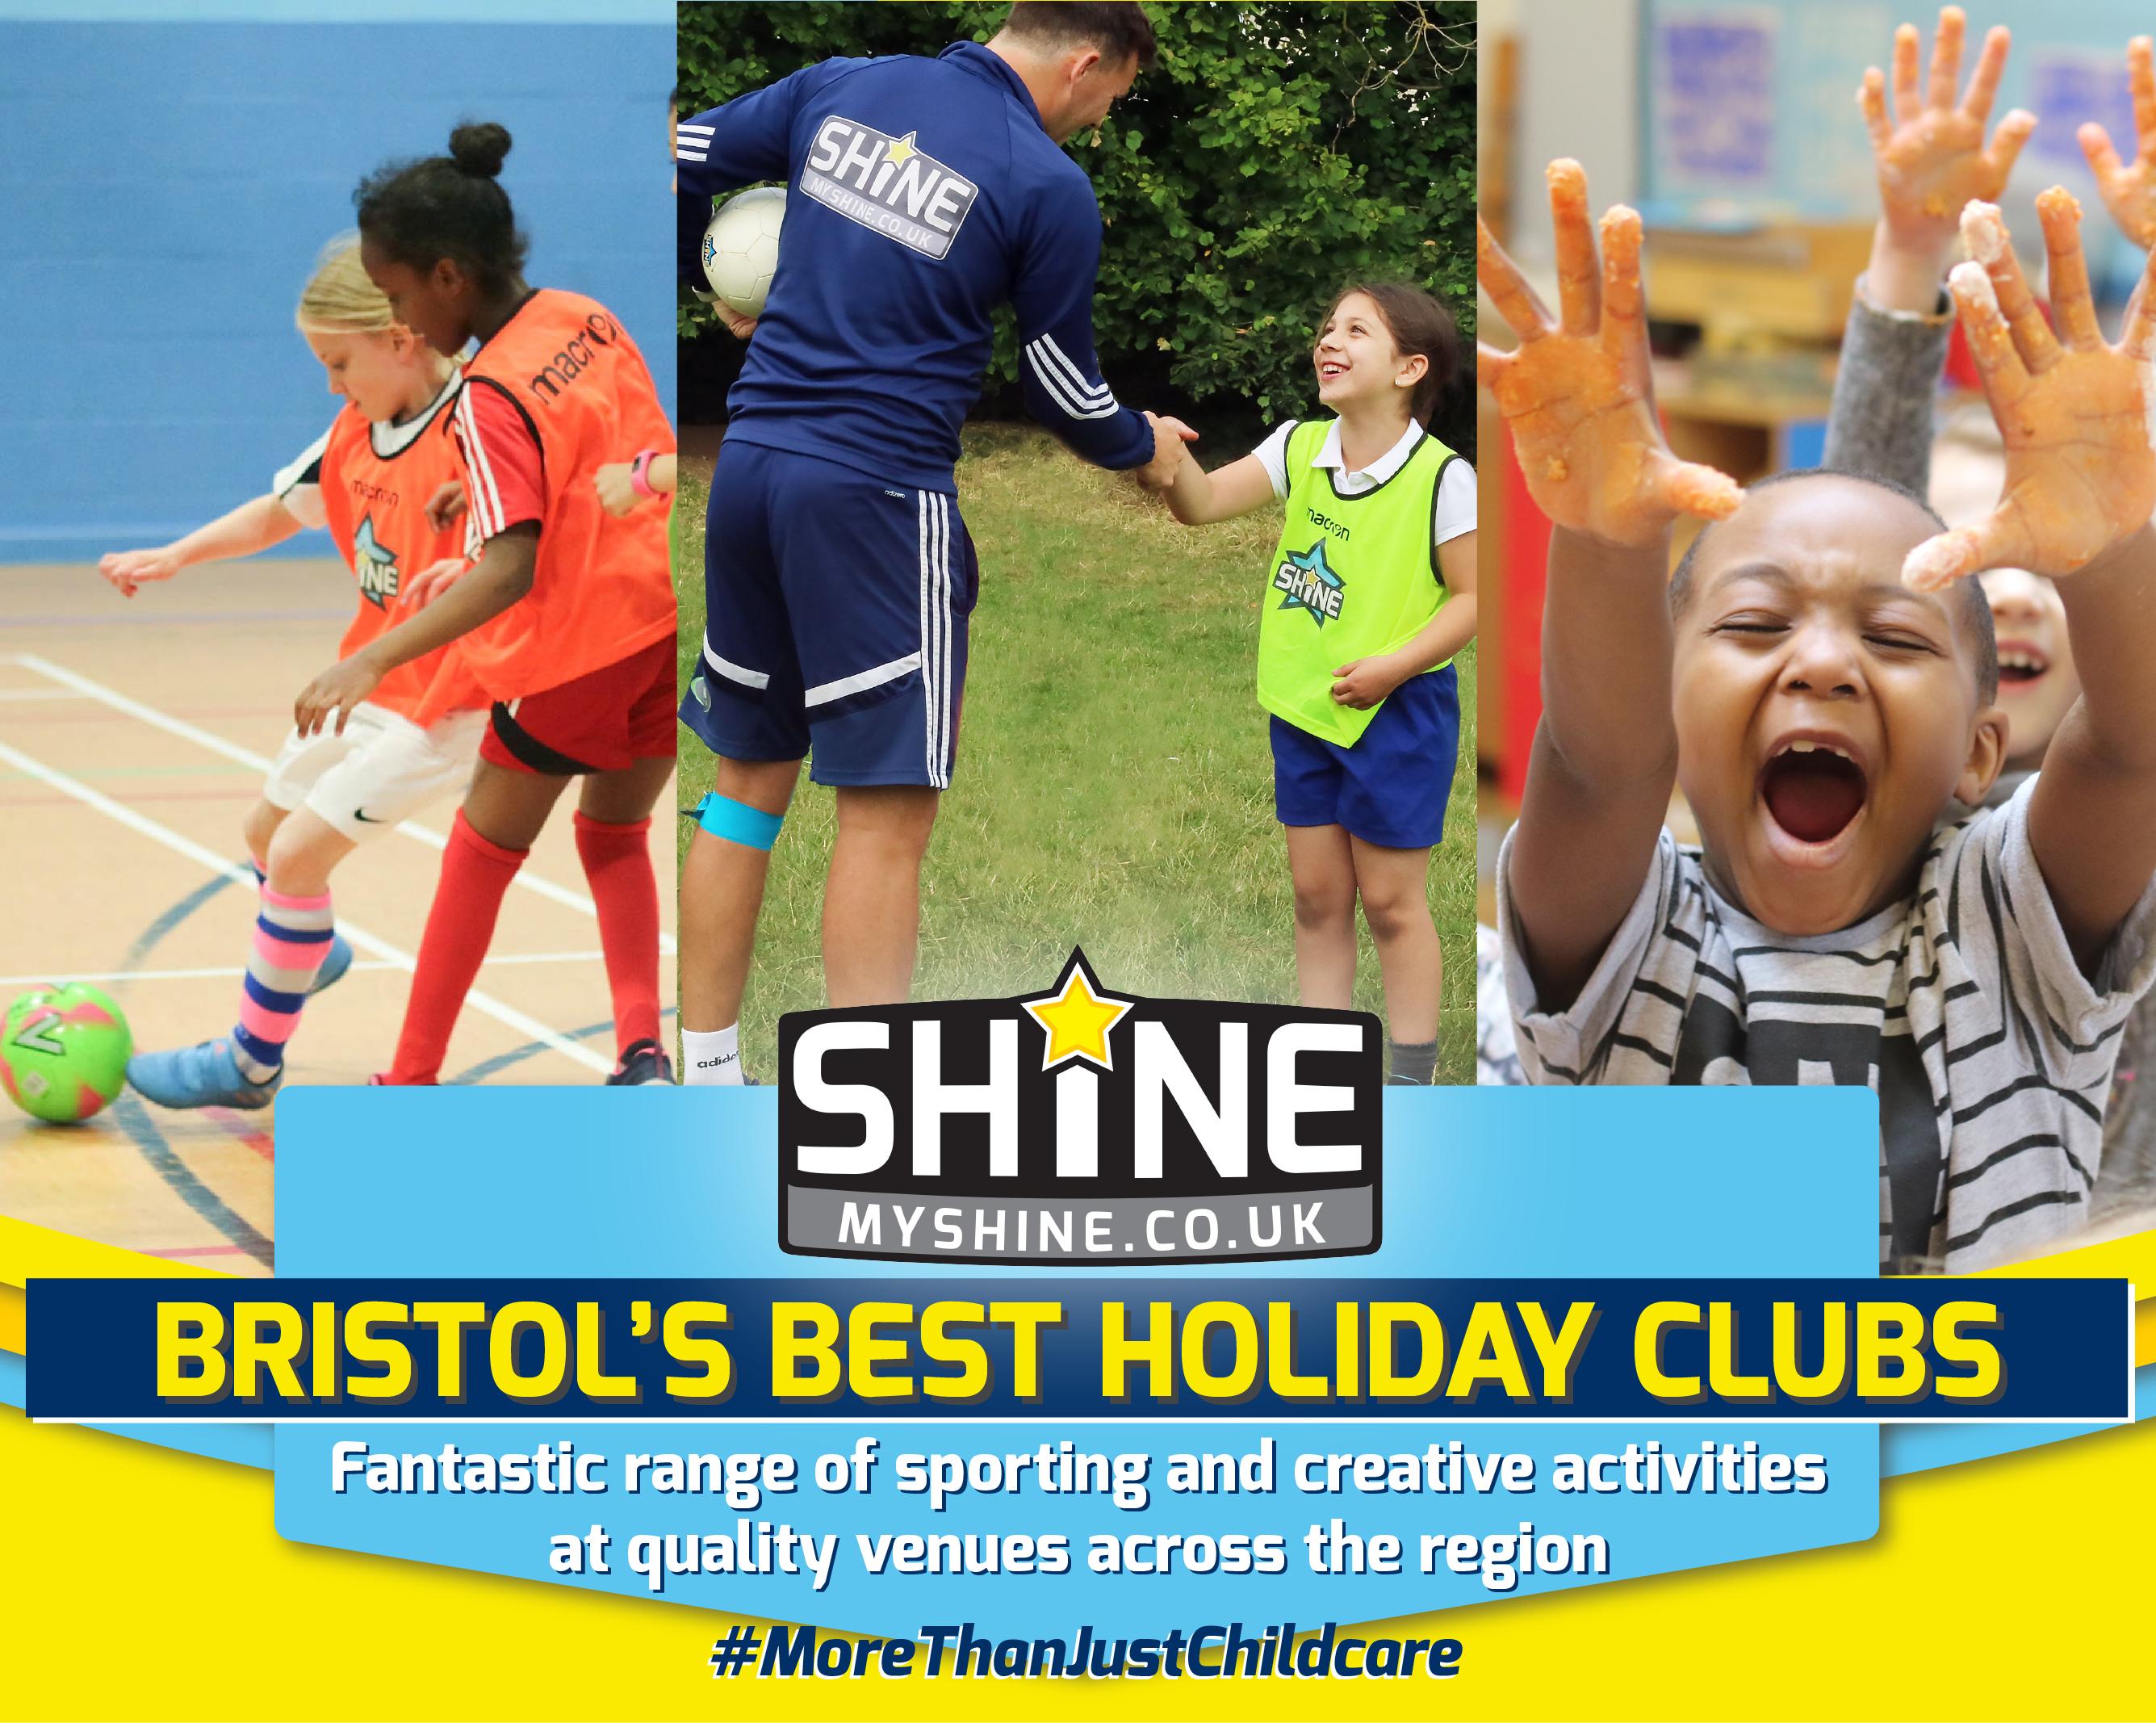 Bristol's Best Holiday Clubs